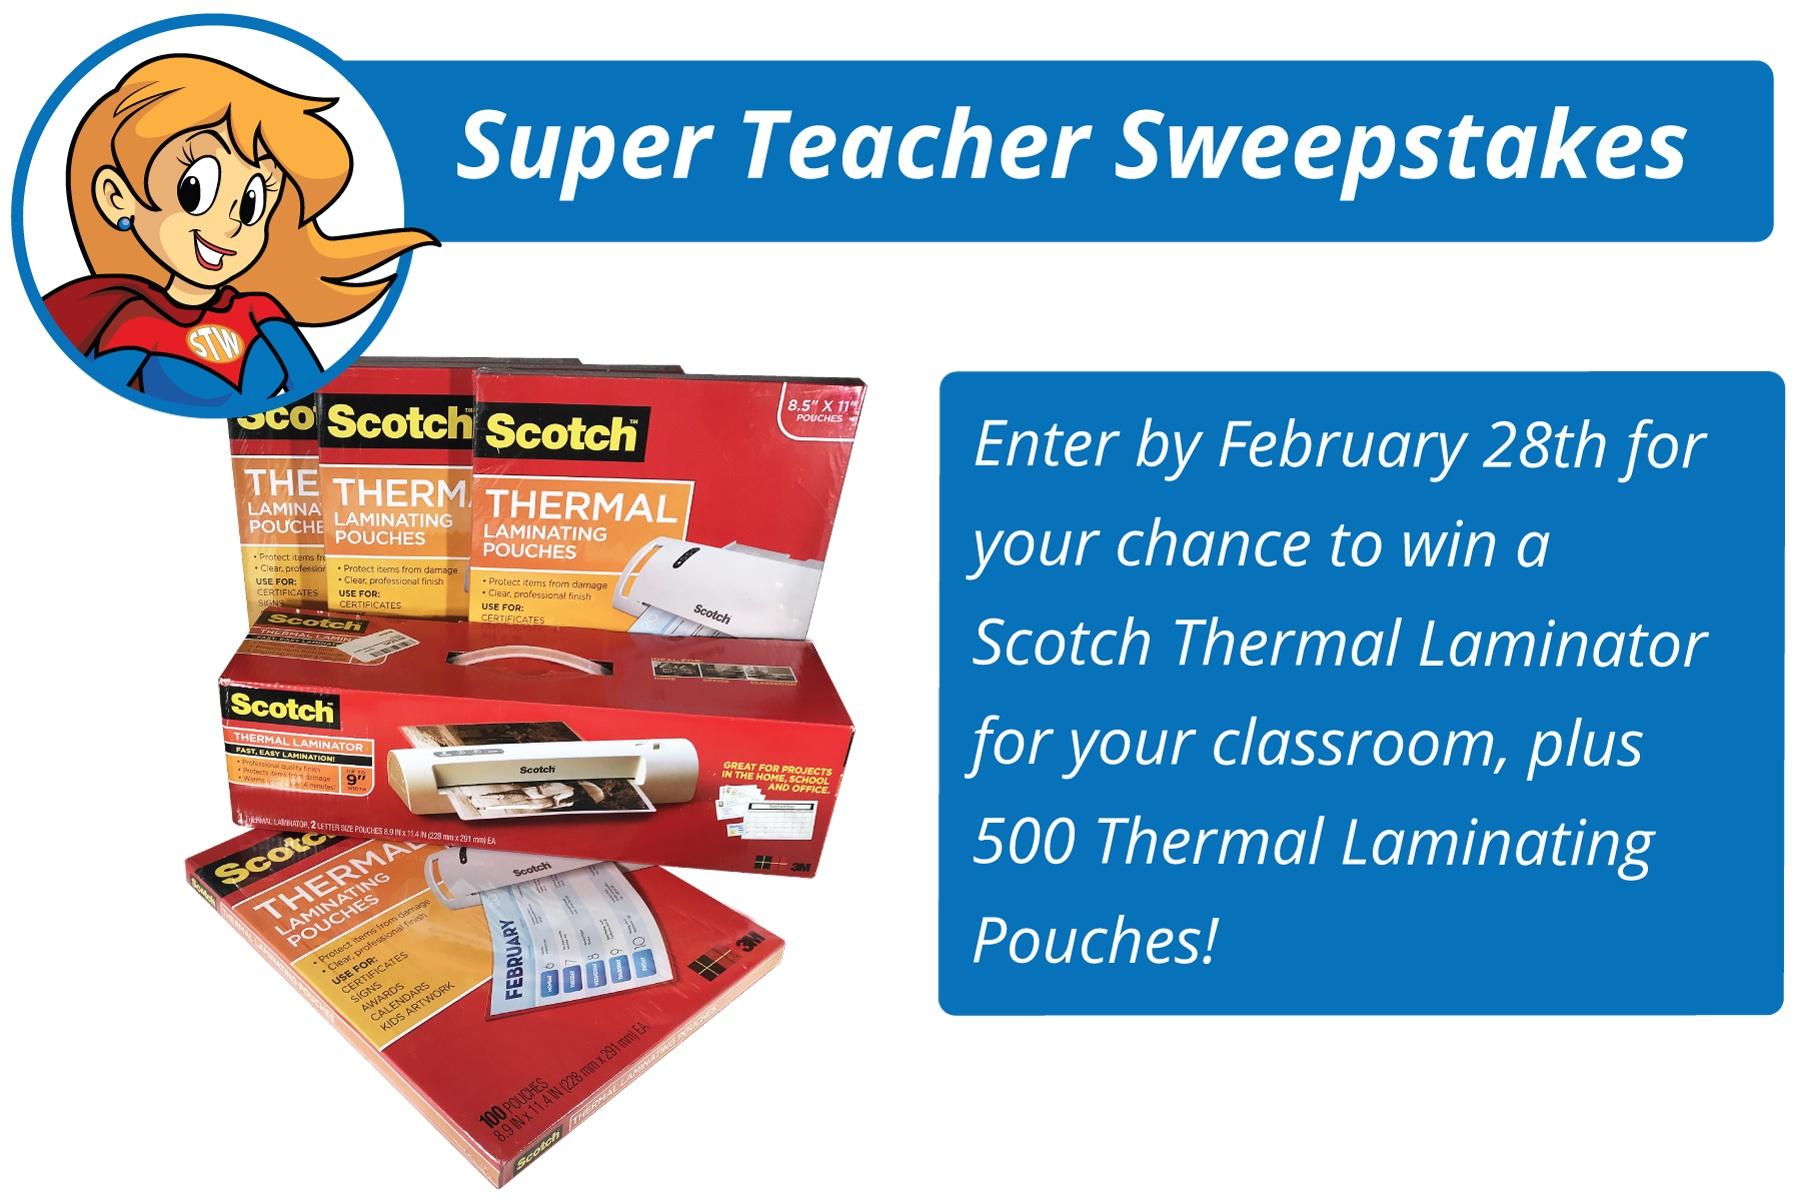 Super Teacher Sweepstakes